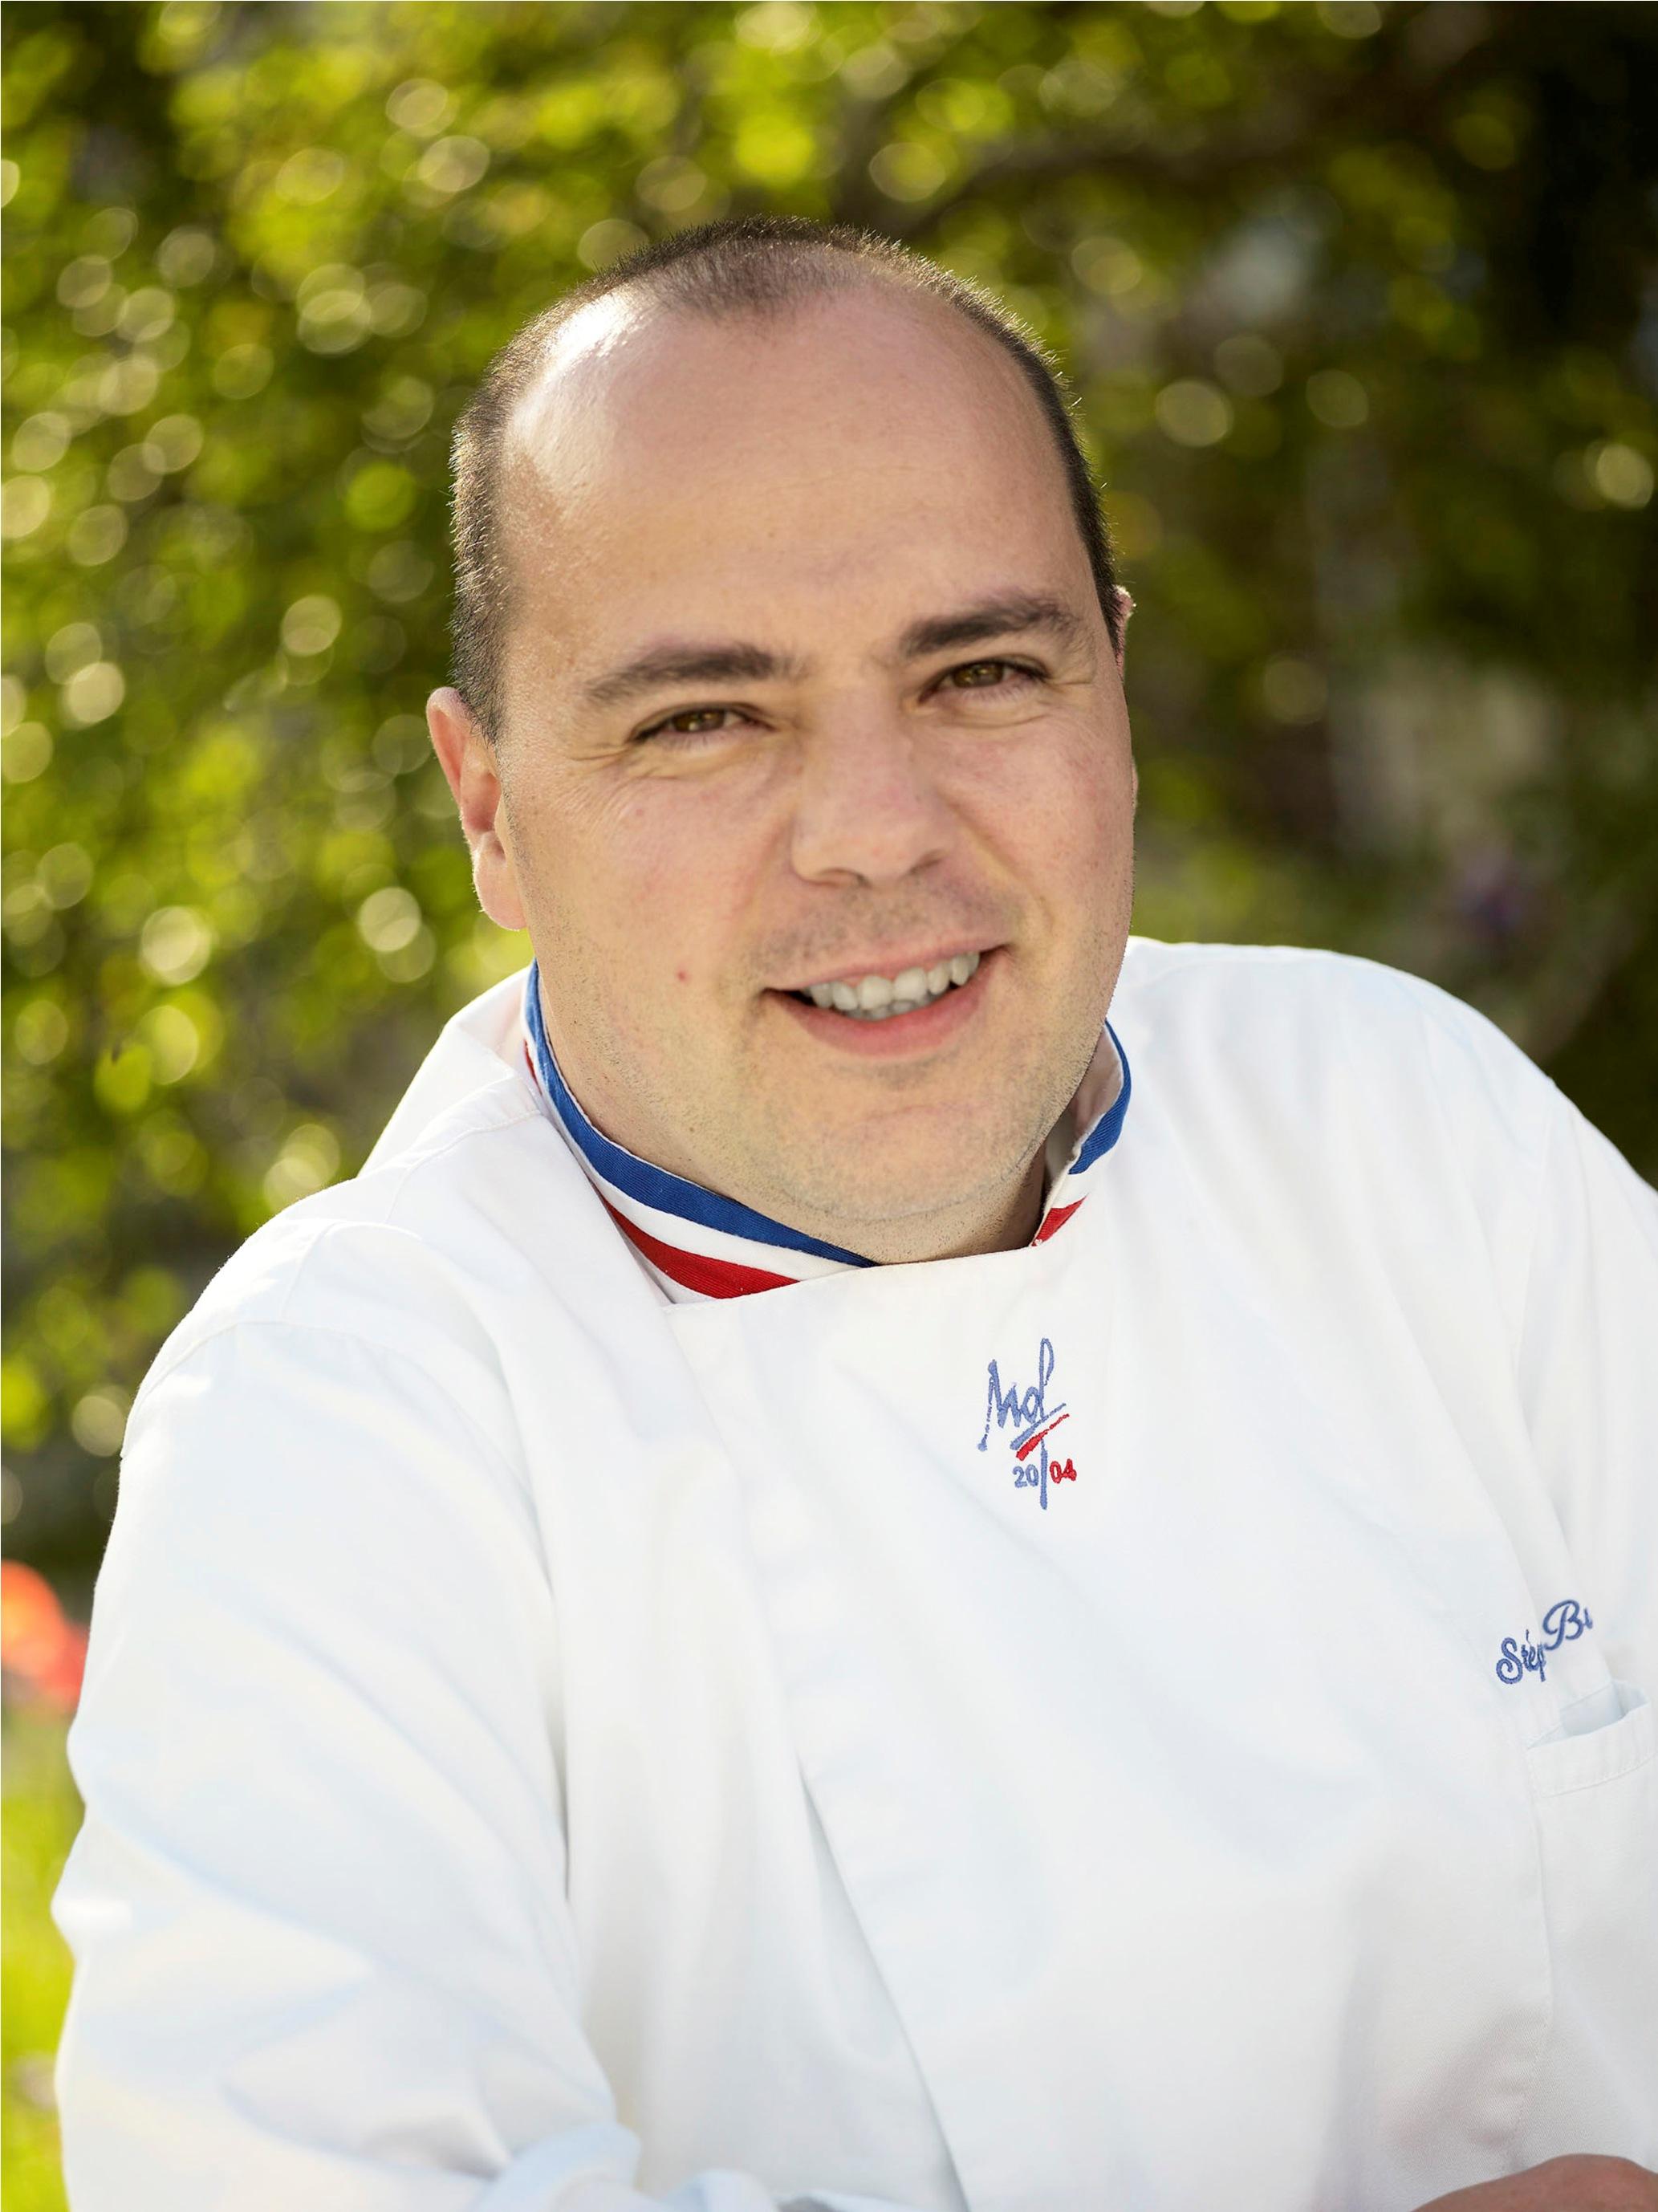 2-Michelin Star Chef Stephane Buron